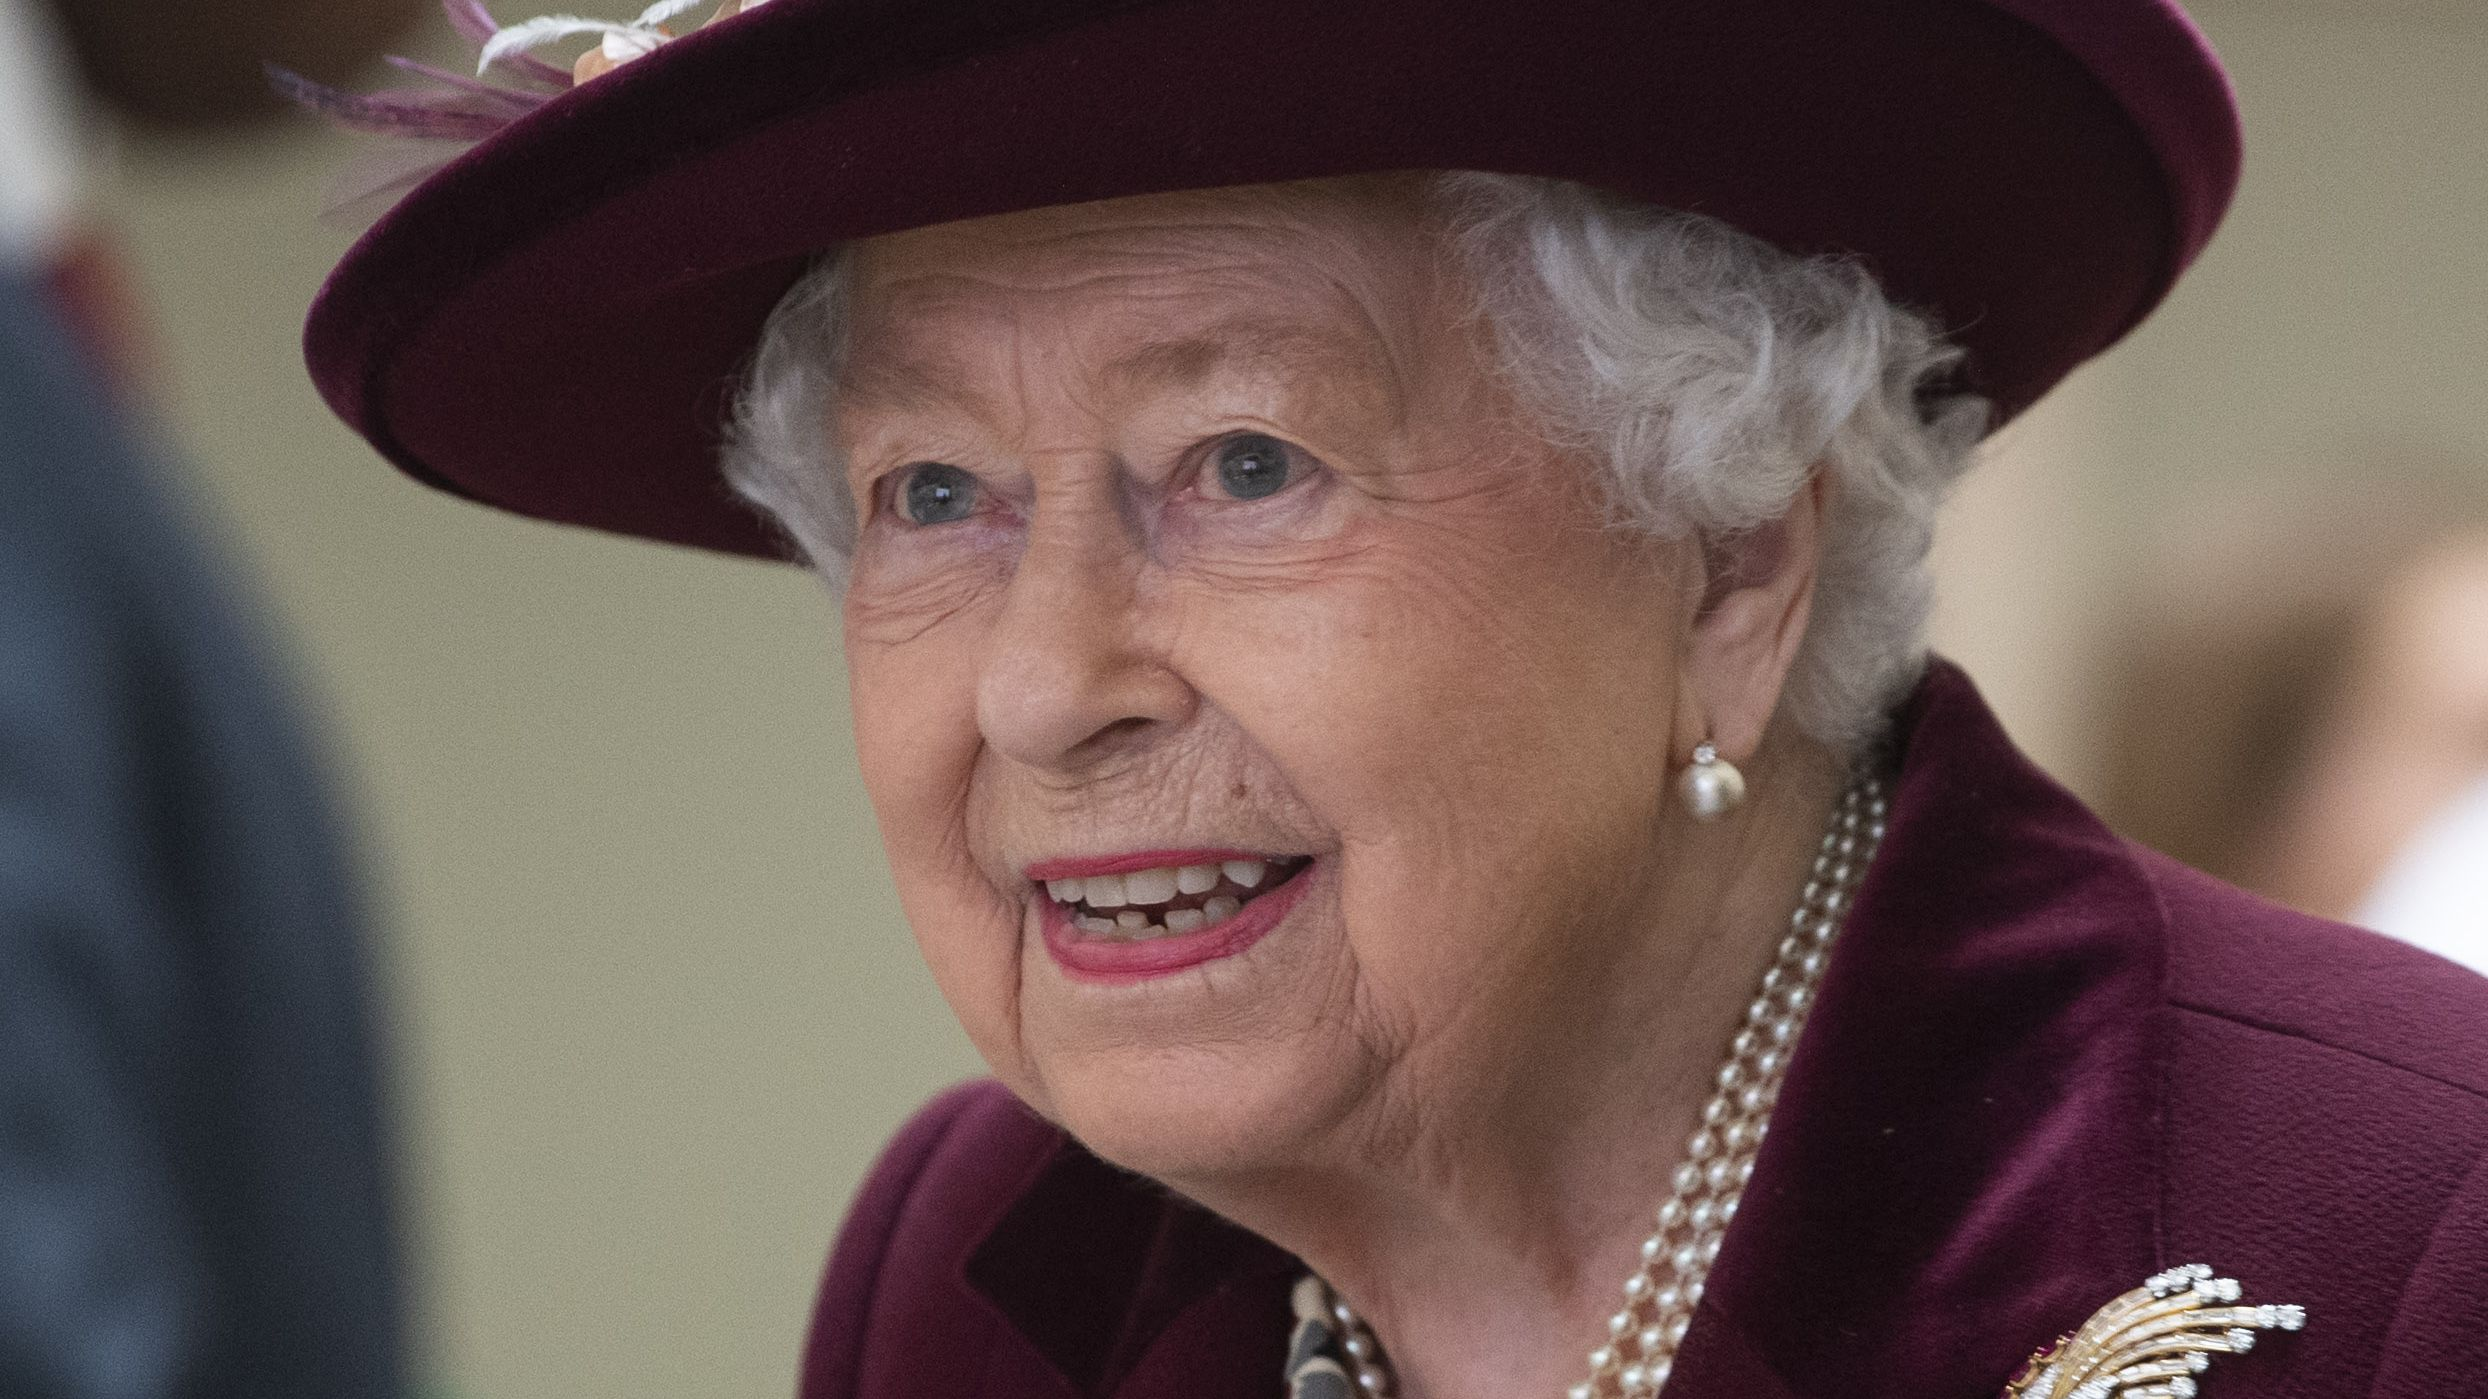 Königin Elizabeth II. (Archivbild, Februar 2020)